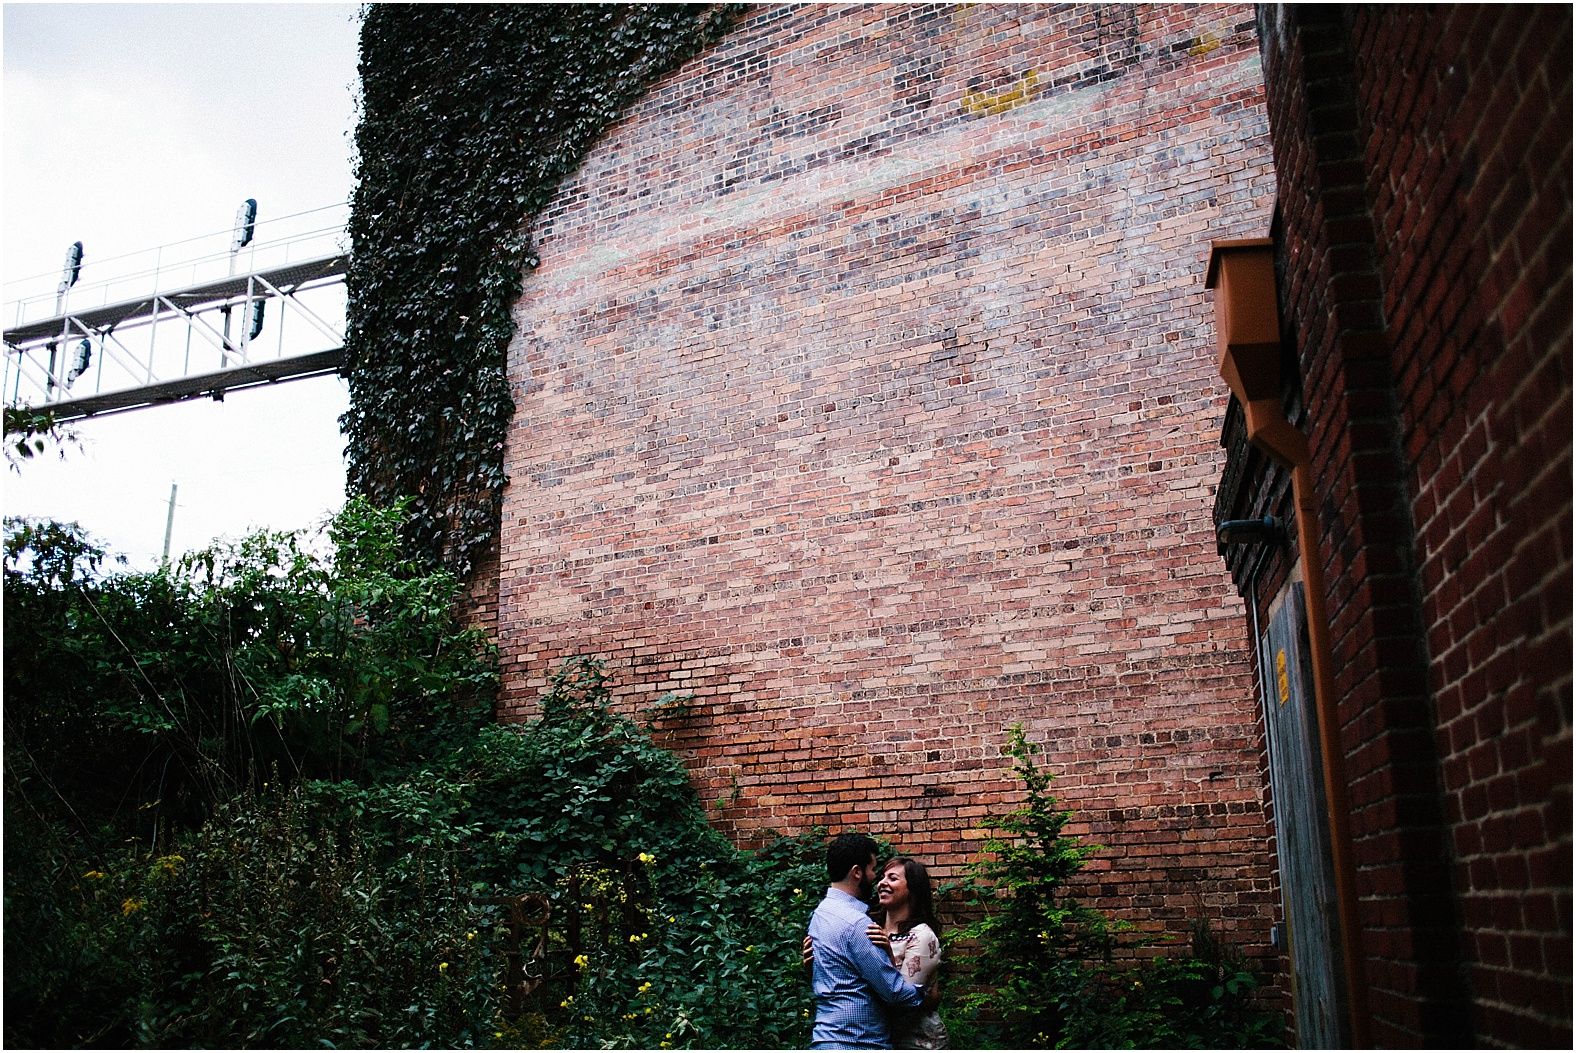 manzanita photo by rebecca caridad internation wedding photogrpaher, colorado wedding photographer, nashville wedding photographer_0450.jpg